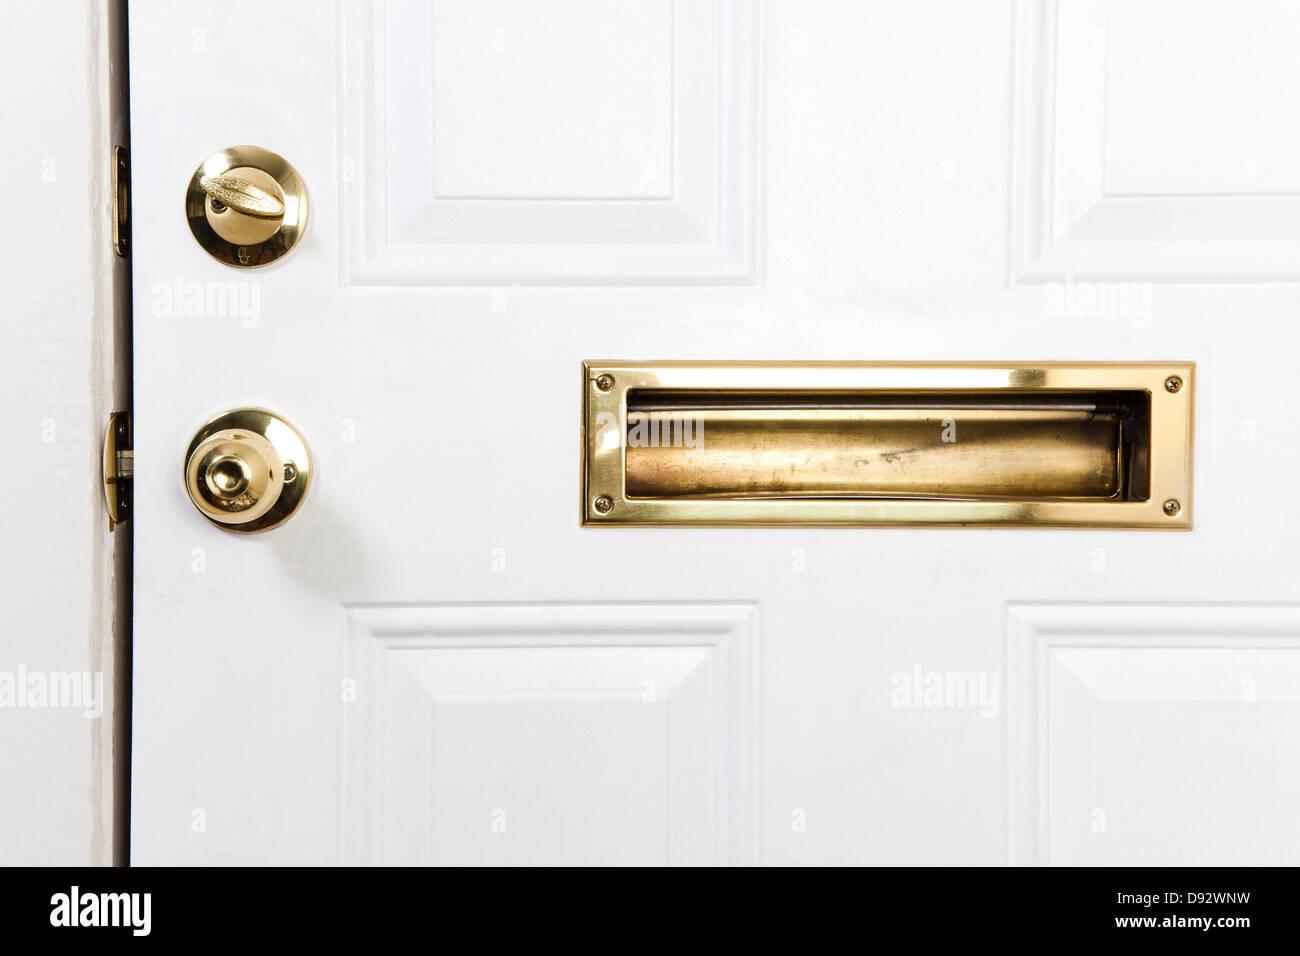 A Front Door With Mail Slot Doorknob And Deadbolt Lock Stock Photo